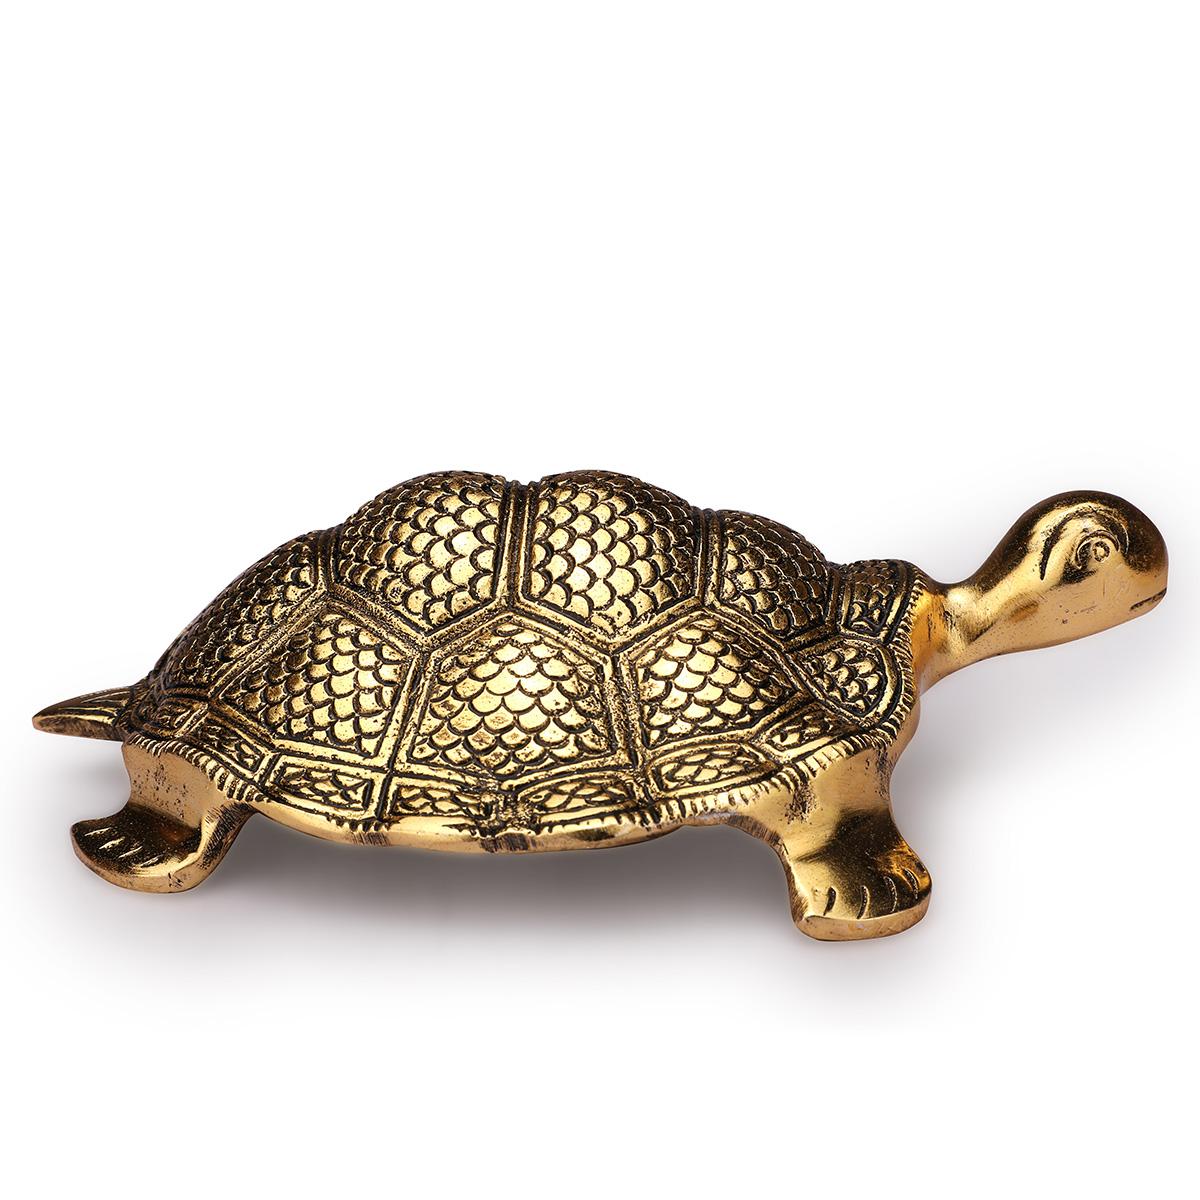 Tortoies 5'' Gold